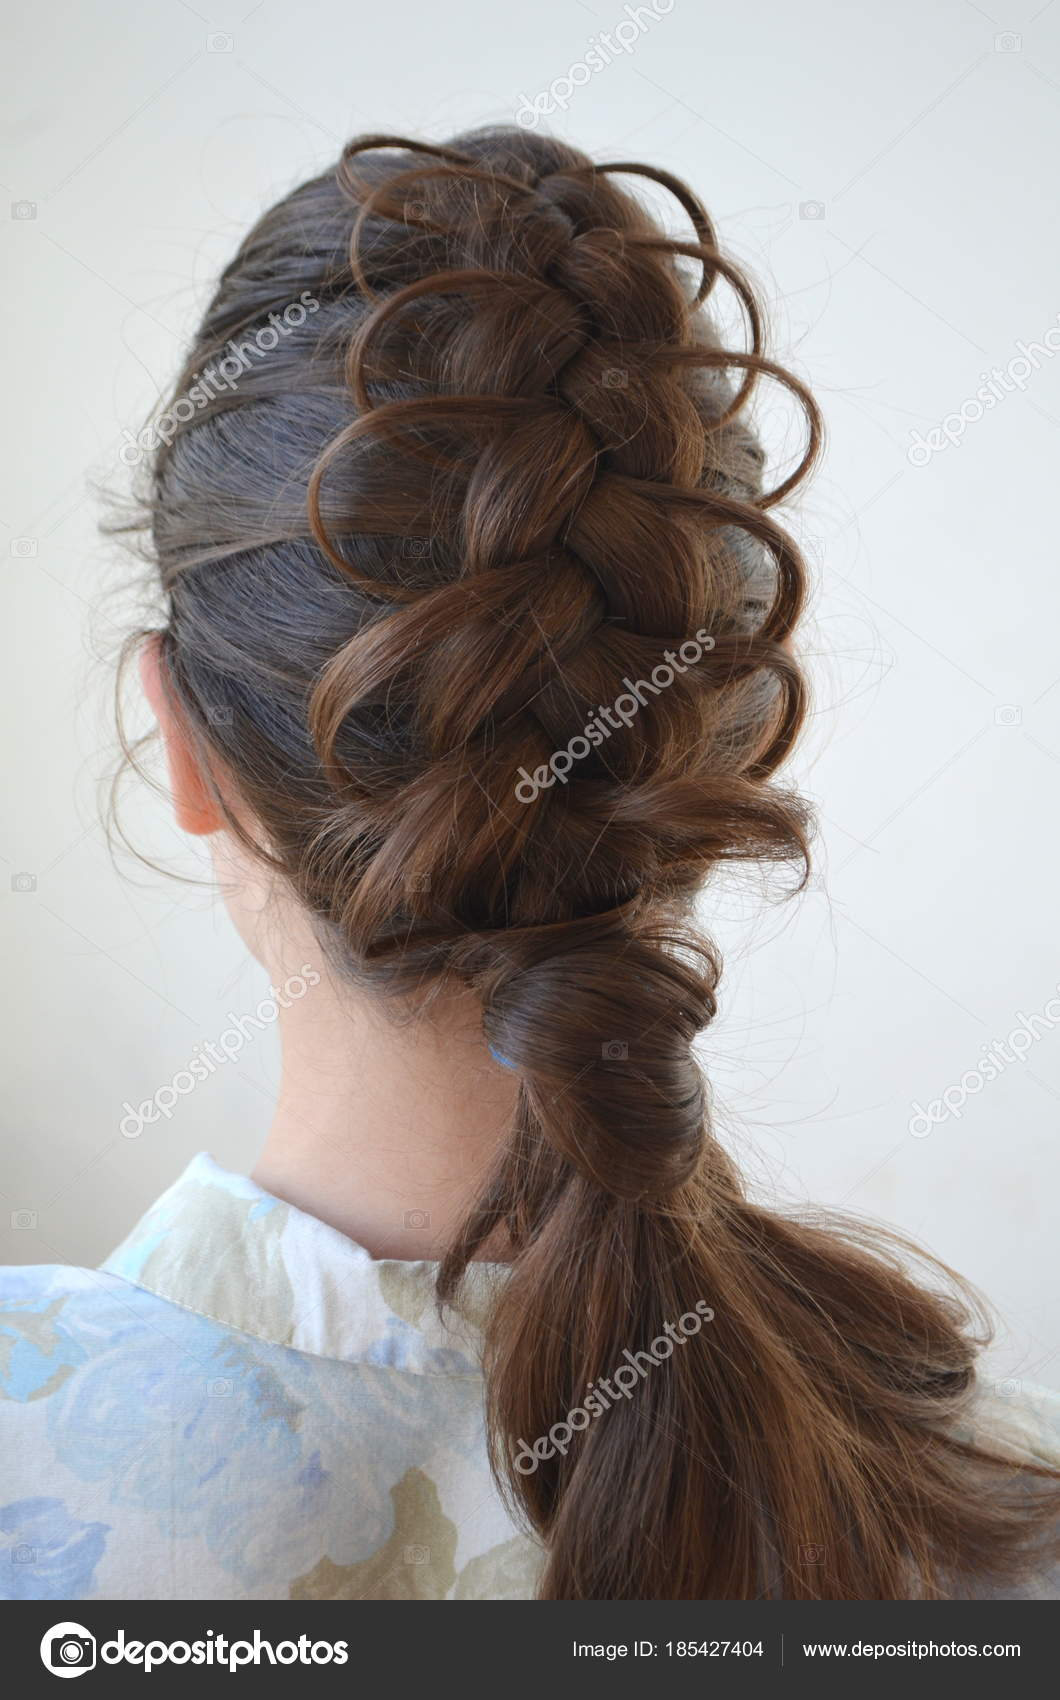 Openwork French Braid Hairstyle Medium Length Mastery Weaving Hair Stock Photo C Yuliyam 185427404